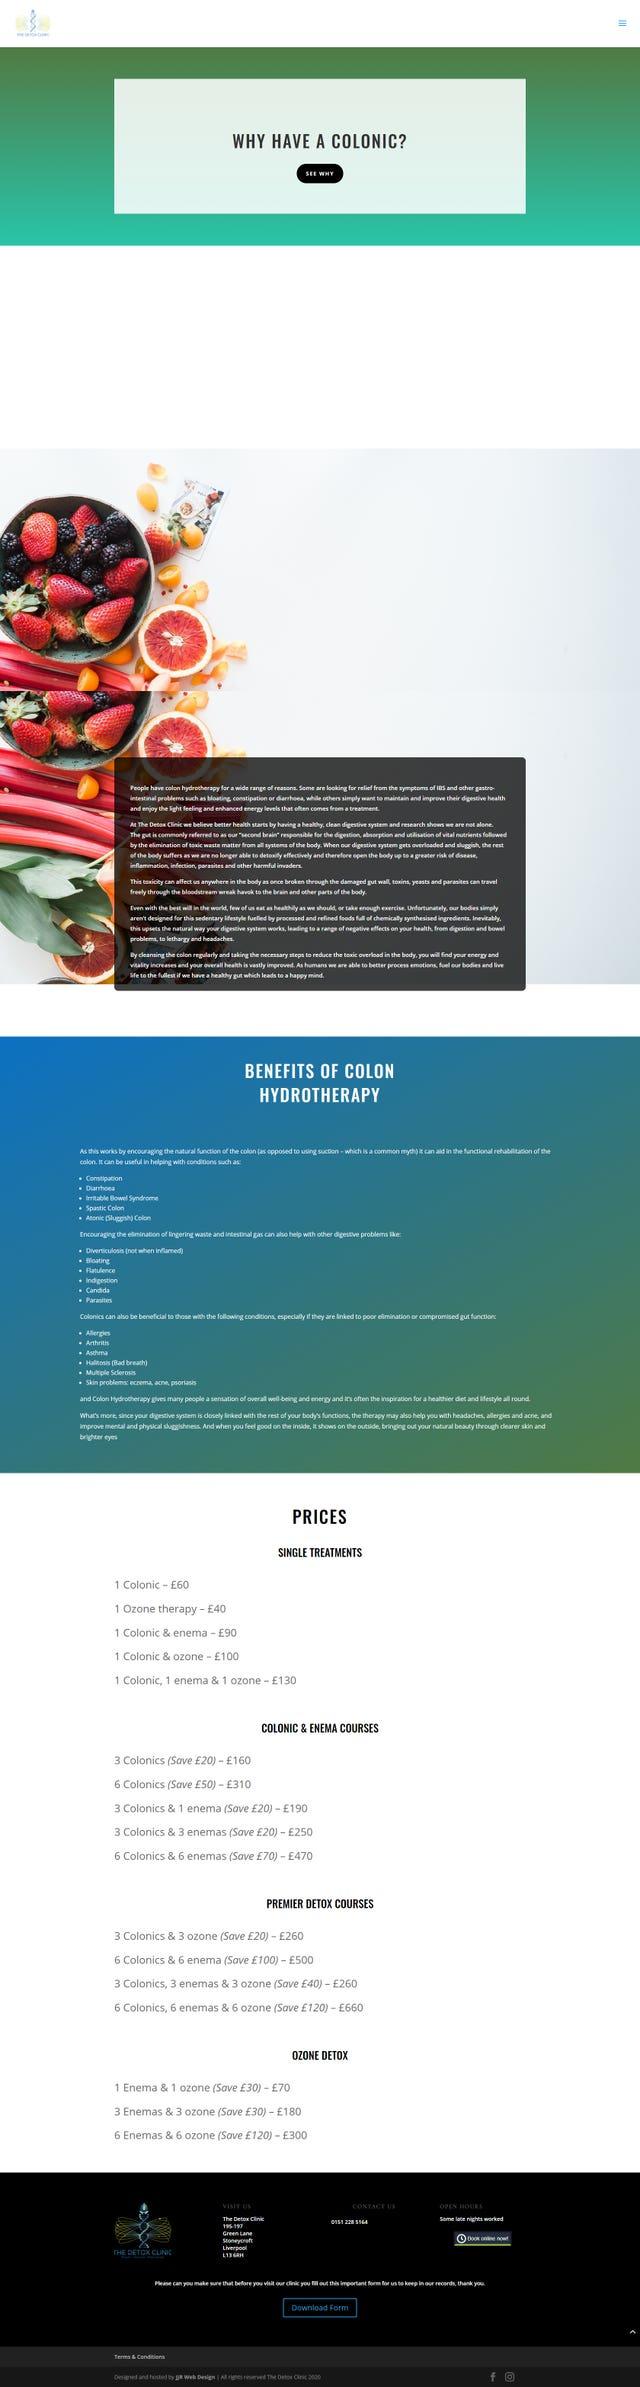 Detox Clinic website